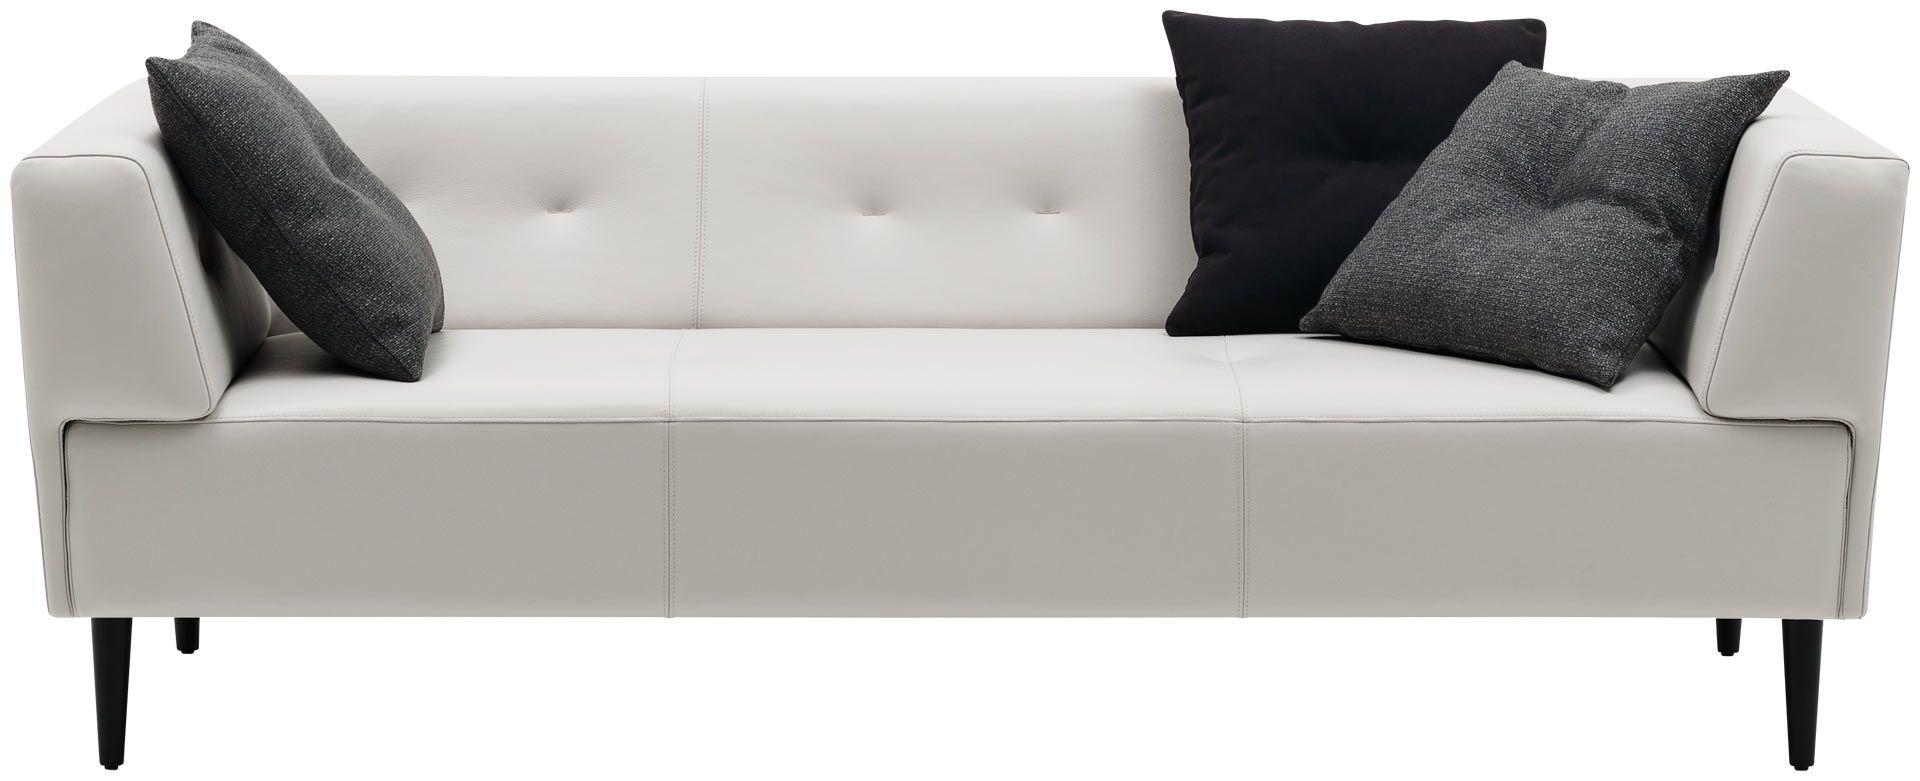 Philly Sofa Customize Your Own Sofa Big Comfy Chair Sofa Sofa Design